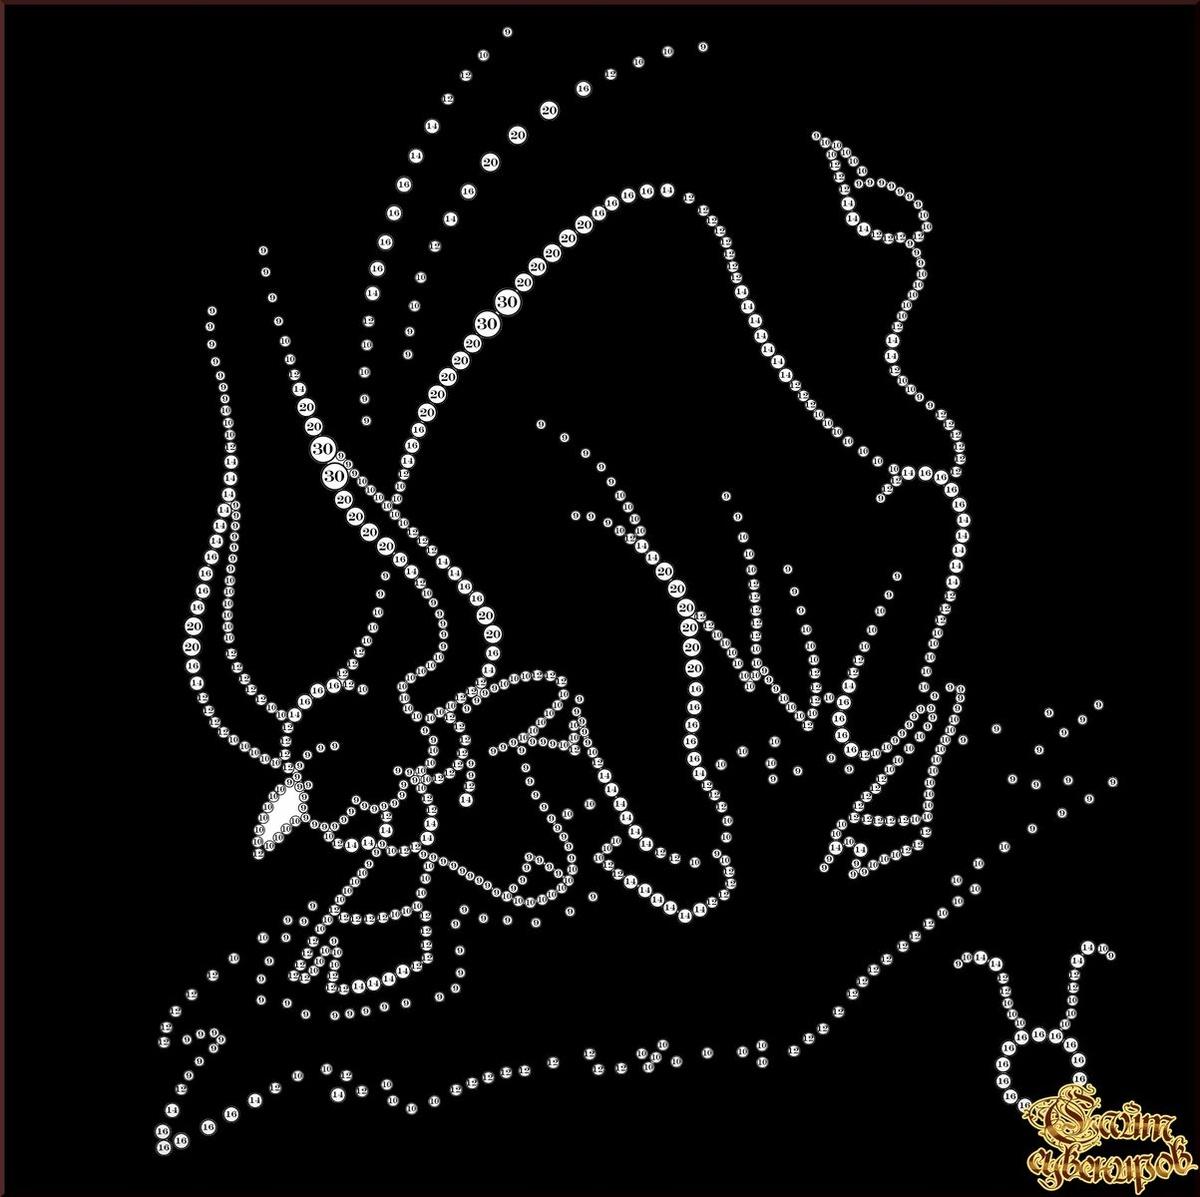 Картинки с стразами скорпиона